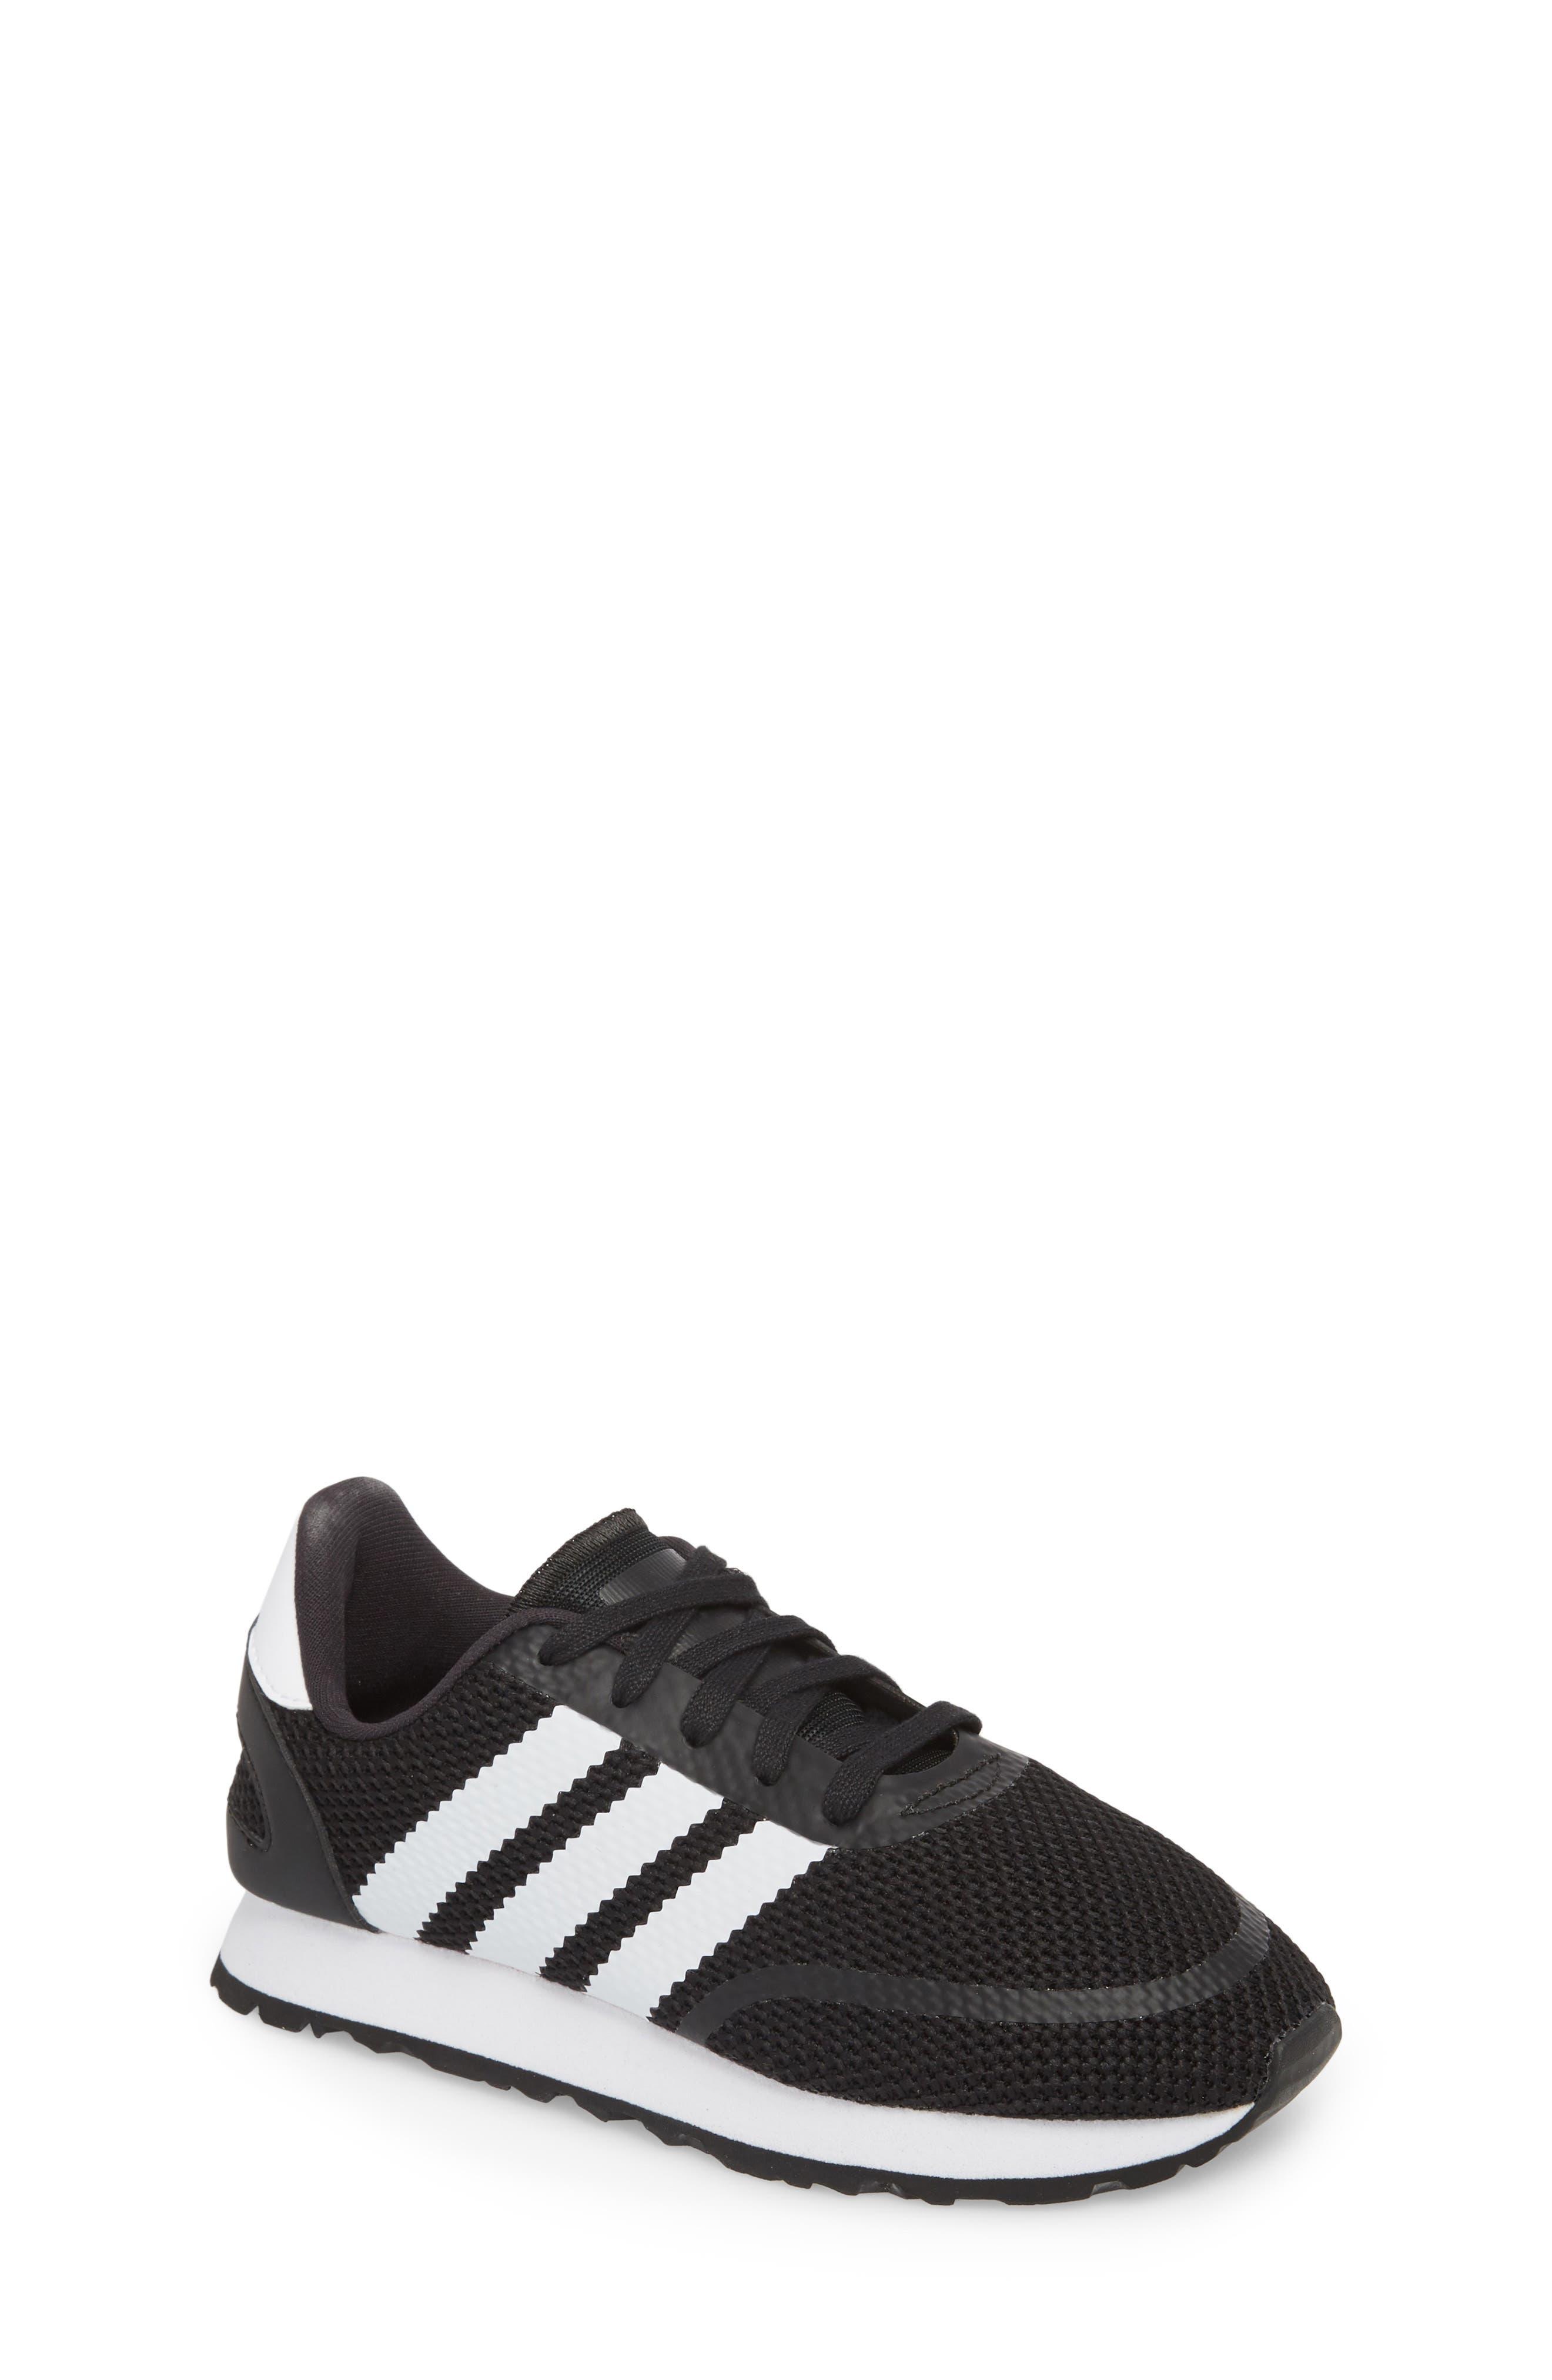 N-5923 Sneaker,                         Main,                         color, Black/ White/ Black